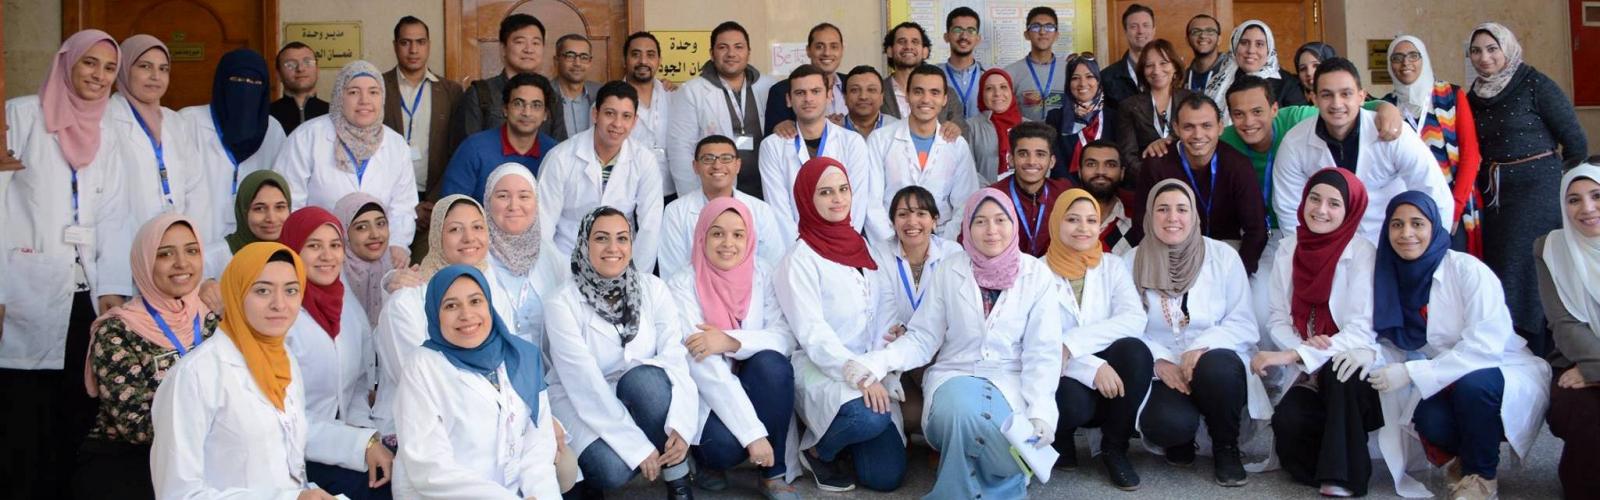 Palestine Polytechnic University (PPU) - خريجتان من كلية العلوم التطبيقية تنهيان تدريب عملي في مجال النانوبيوتكنولوجي (Nano-biotechnology) من خلال أكاديمية الشباب العربية الألمانية للعلوم والعلوم الإنسانية